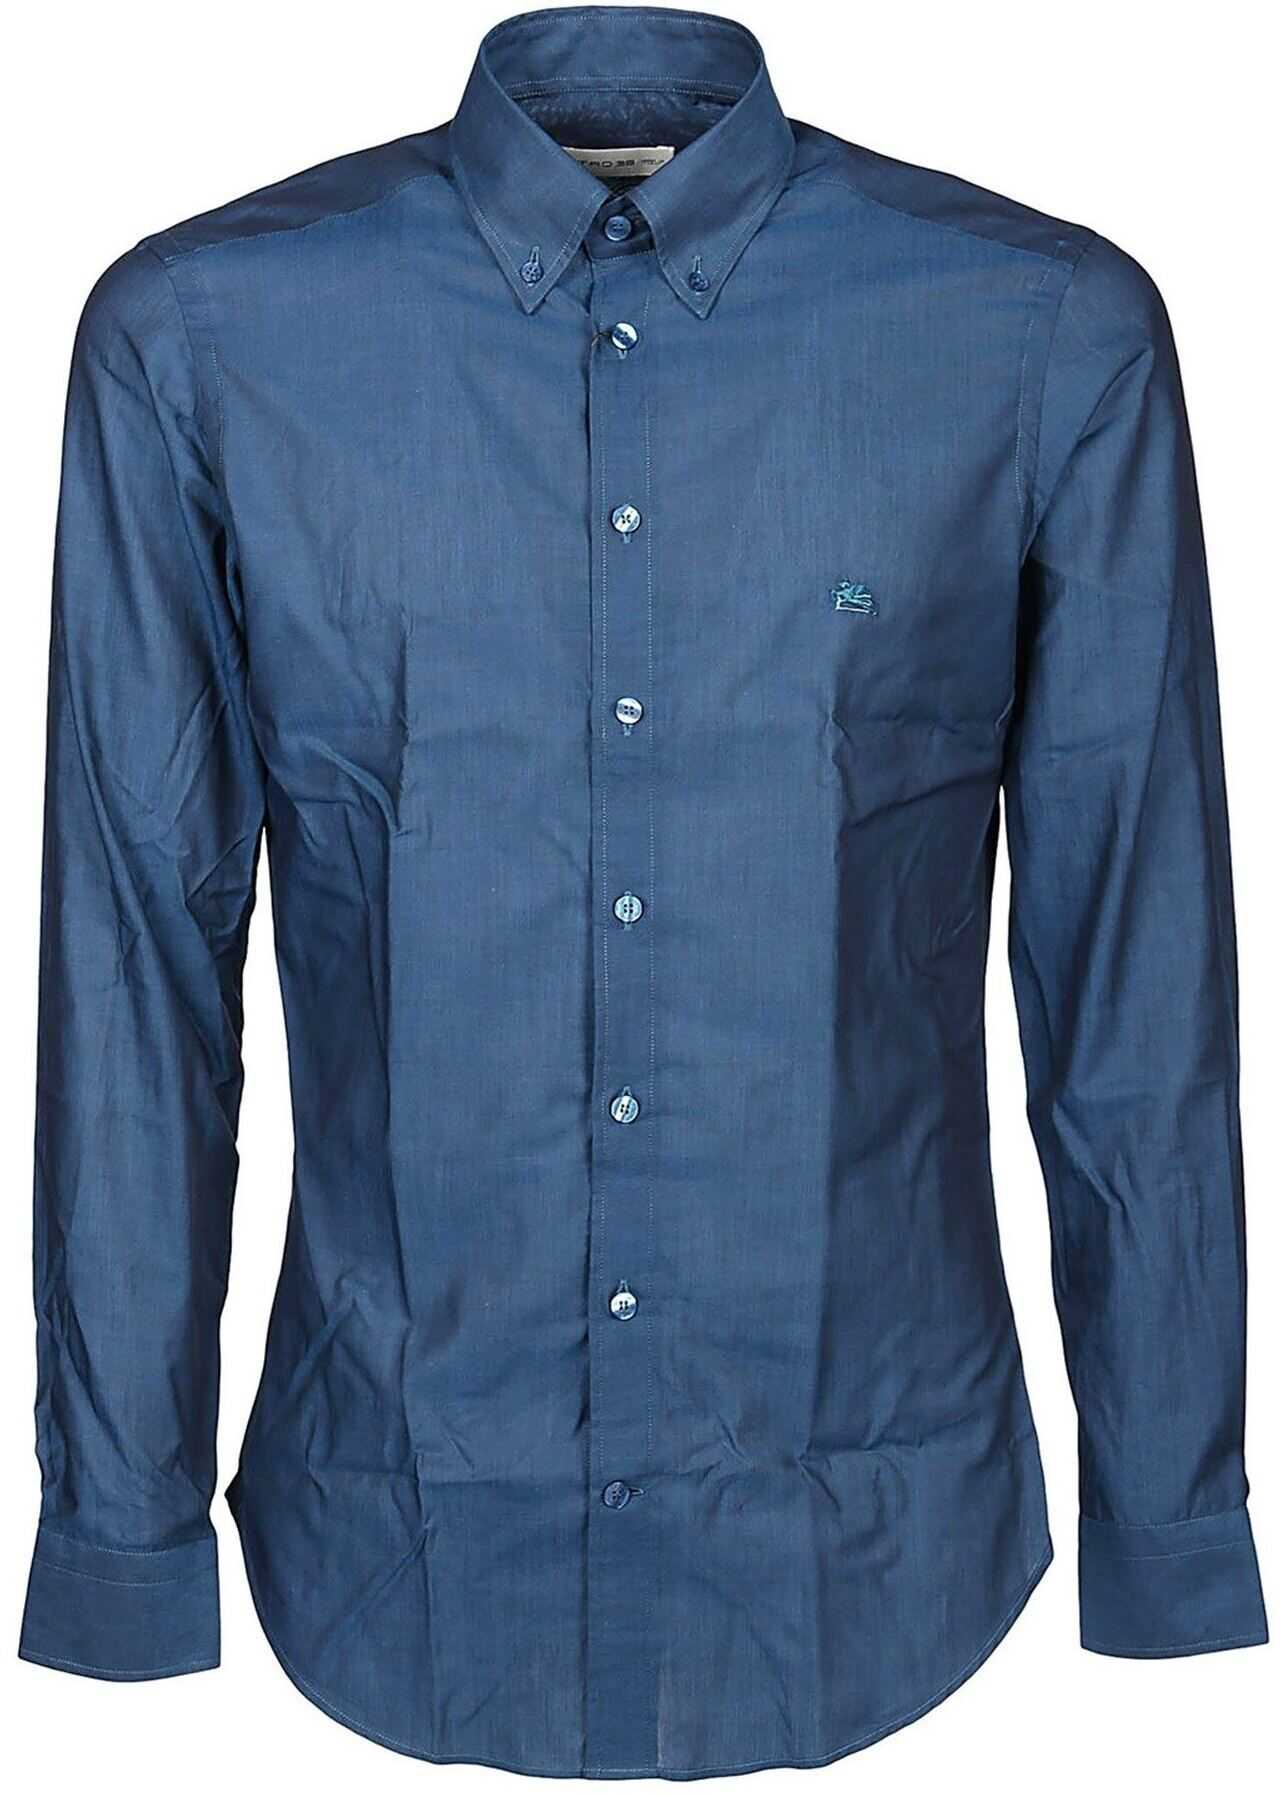 ETRO Cotton Poplin Shirt In Blue Blue imagine